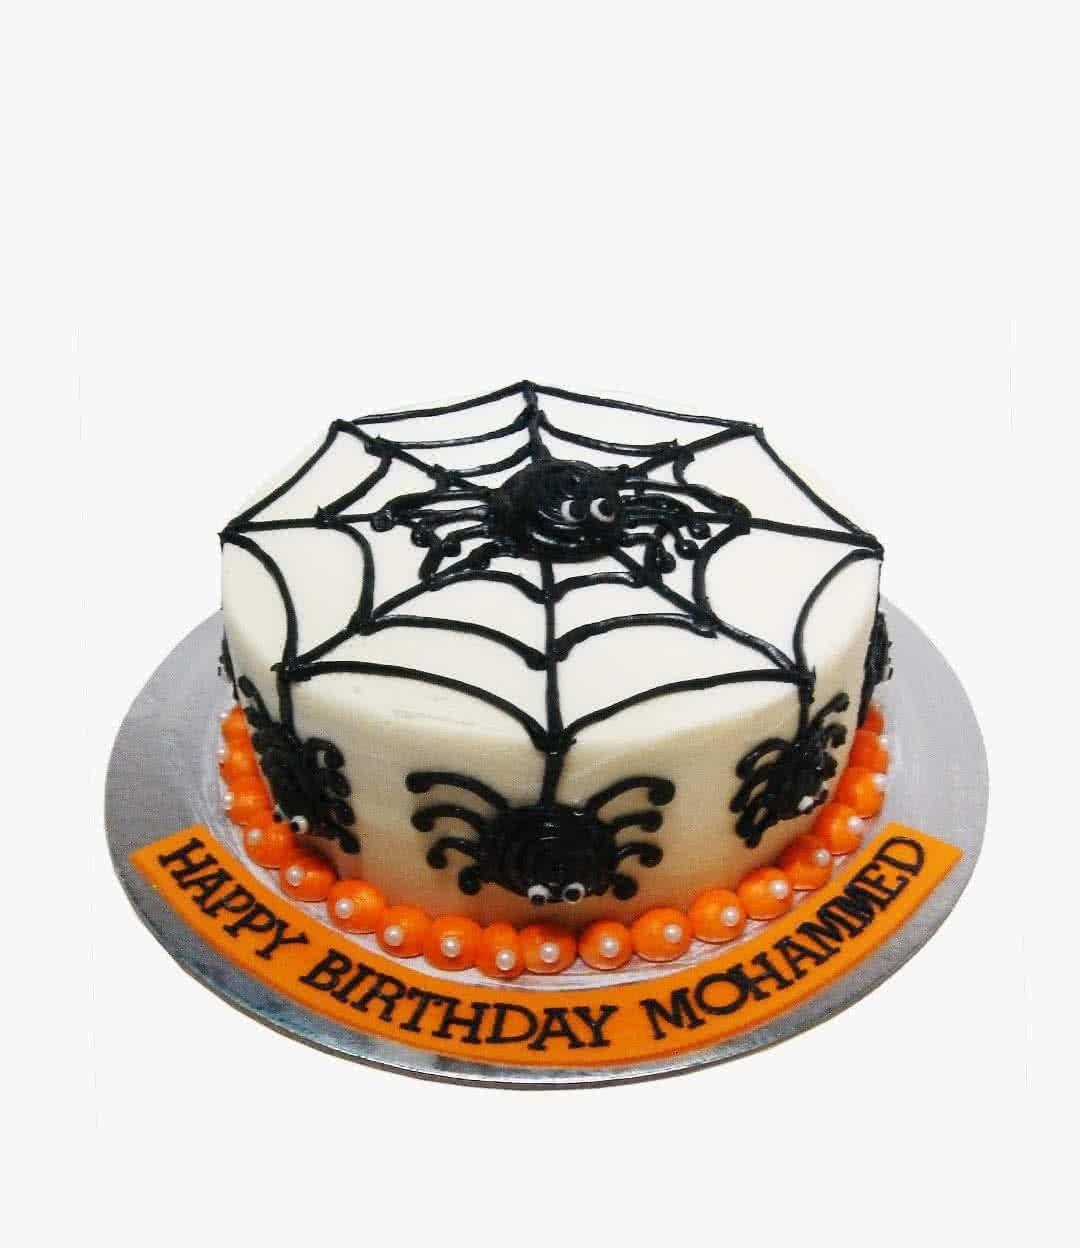 23 Exclusive Photo Of Halloween Birthday Cake Happy Delivery In Dubai Joi